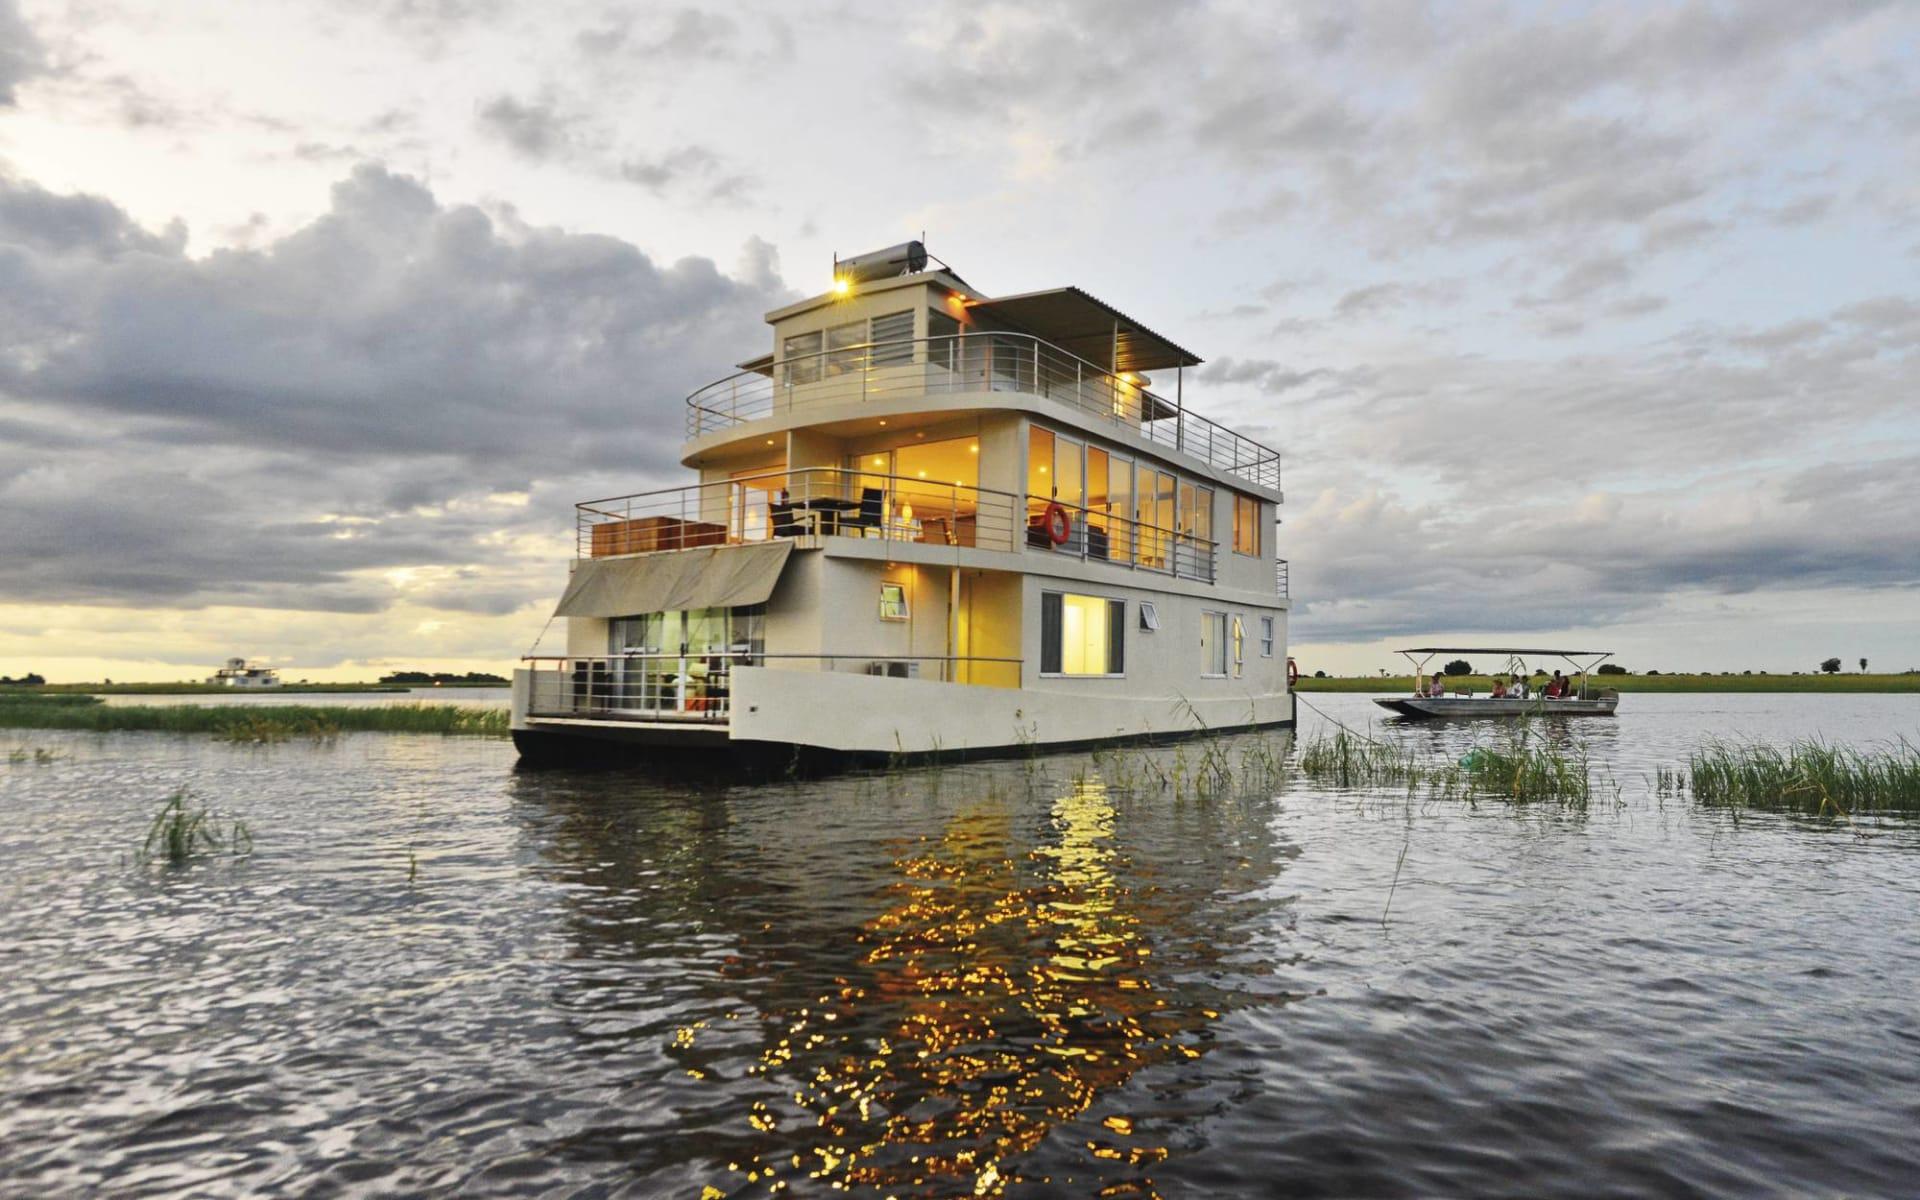 Chobe Princess ab Kasane: Botswana - Chobe Princess - Aussenansicht Schiff auf Fluss